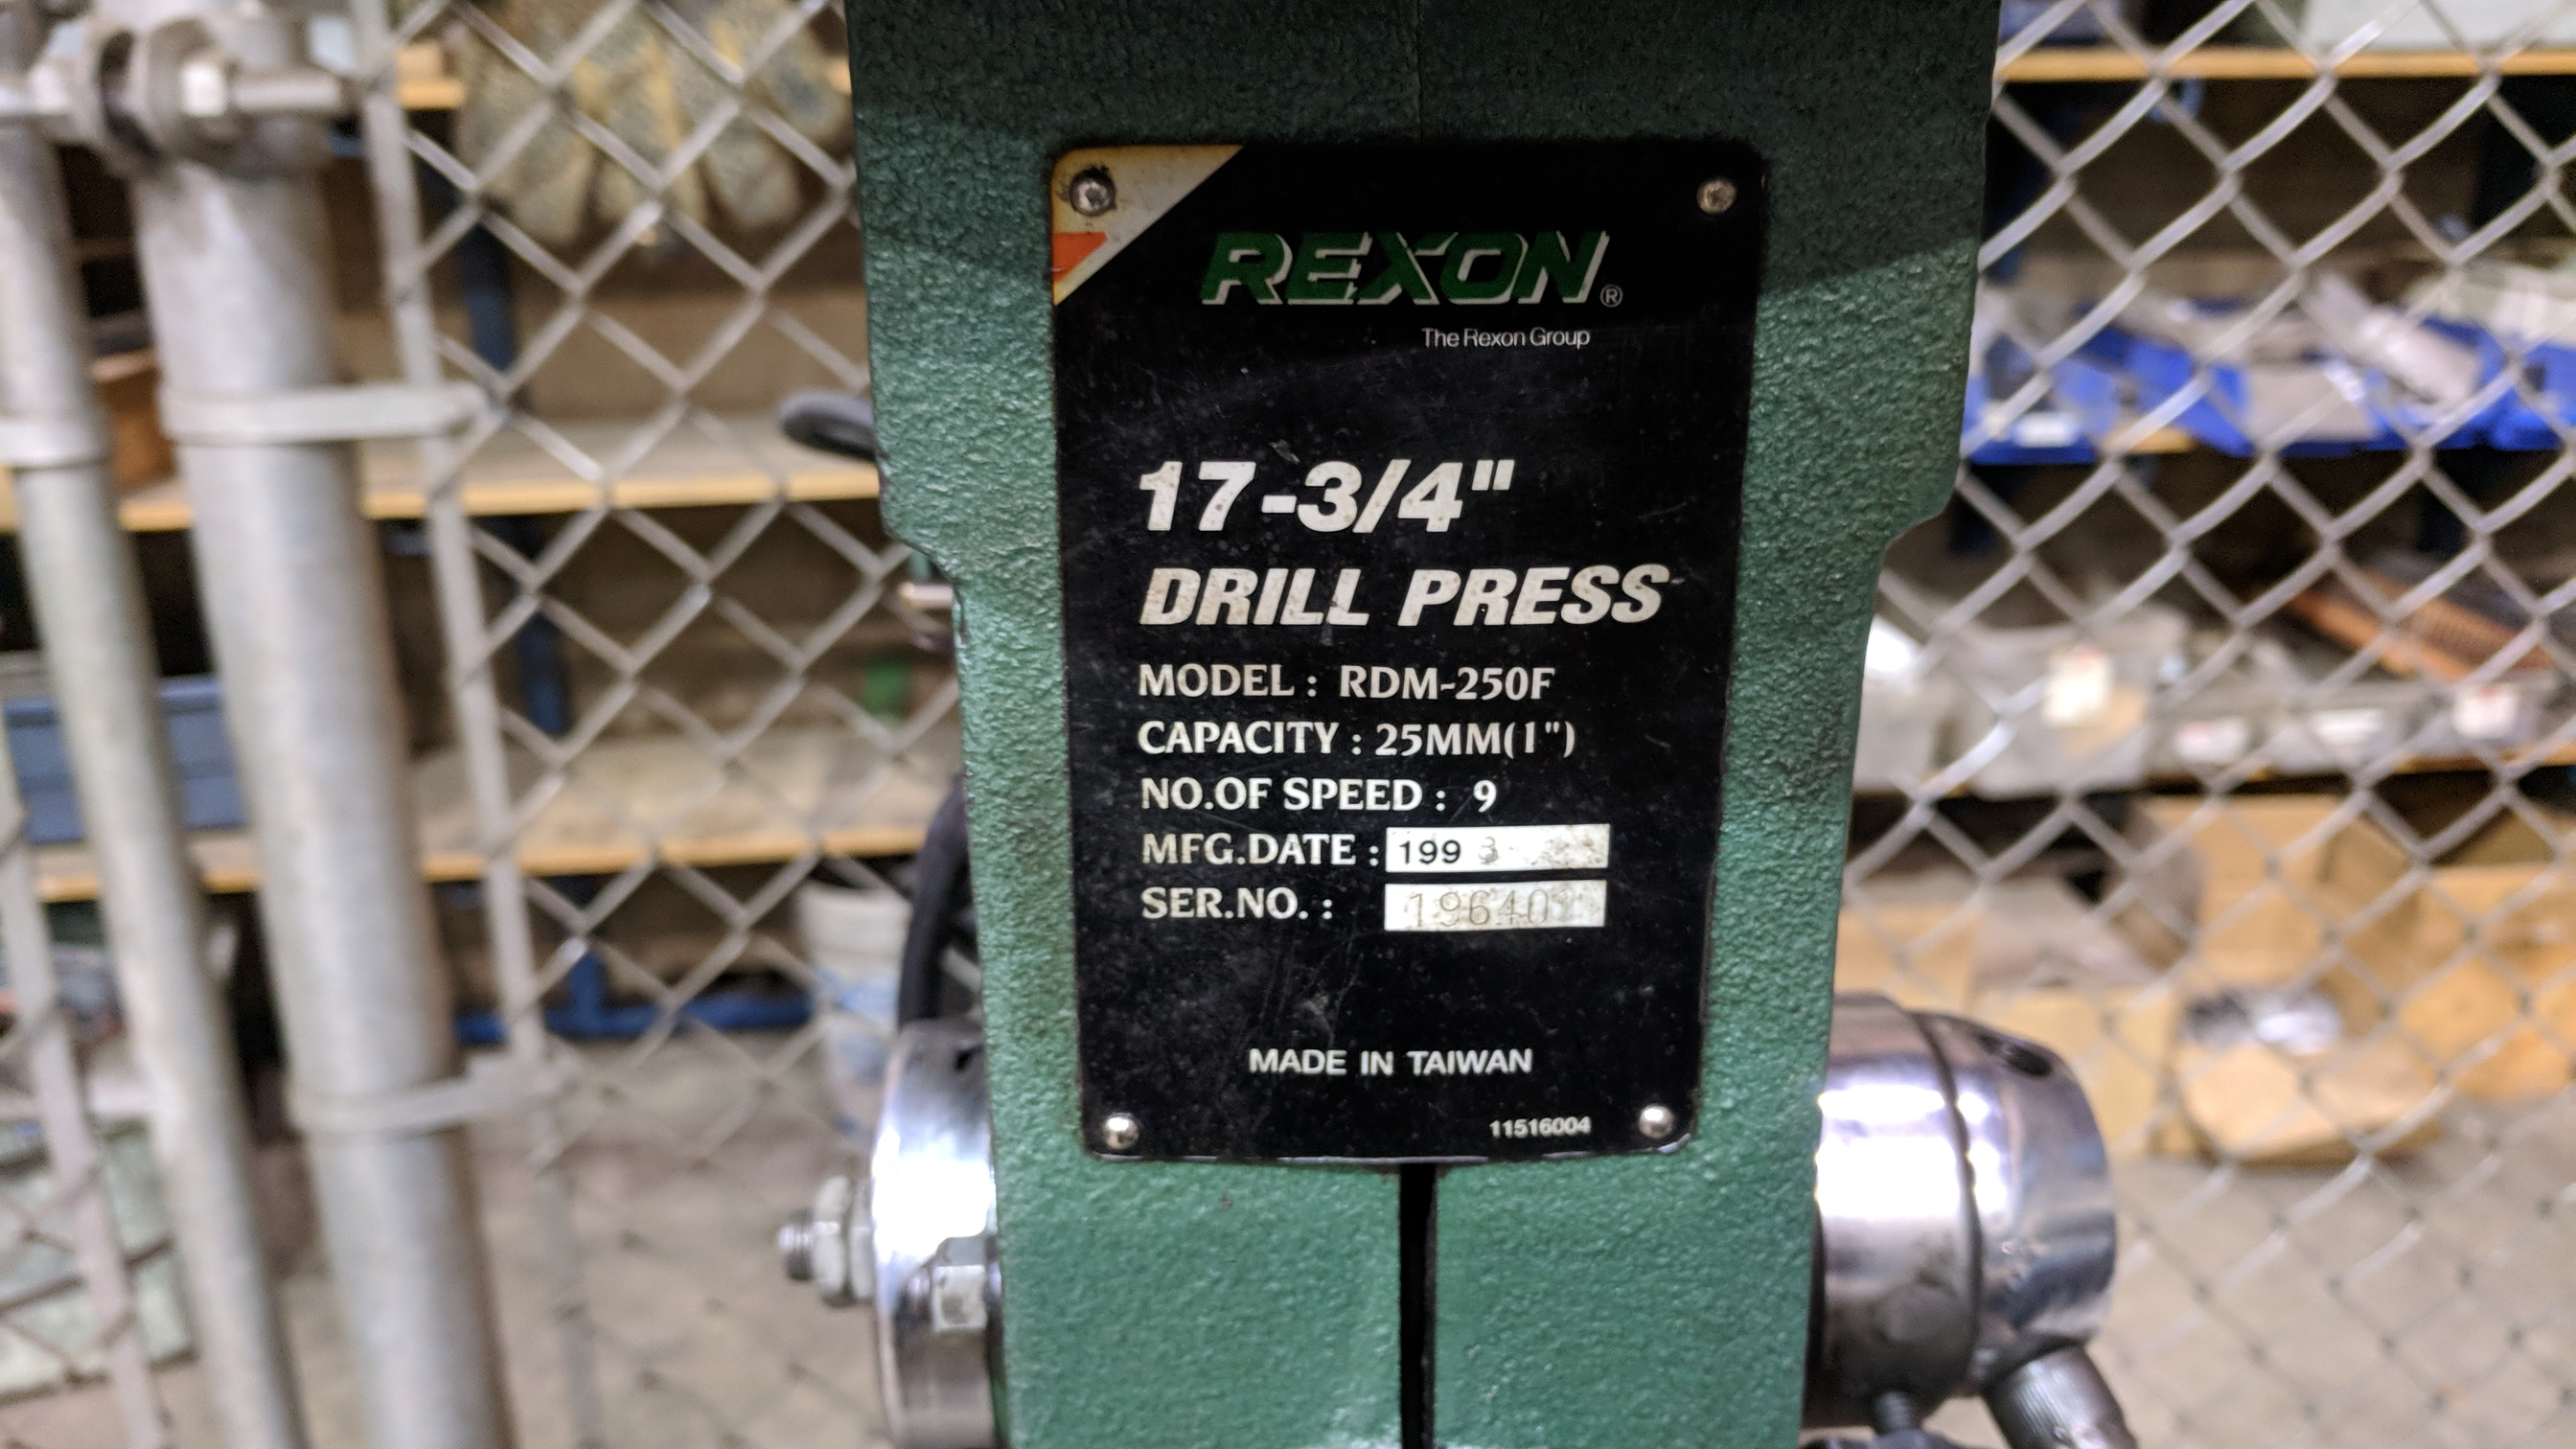 REXON (1998) RDM-250F HEAVY DUTY FLOOR TYPE DRILL PRESS, S/N 196402 - Image 2 of 2